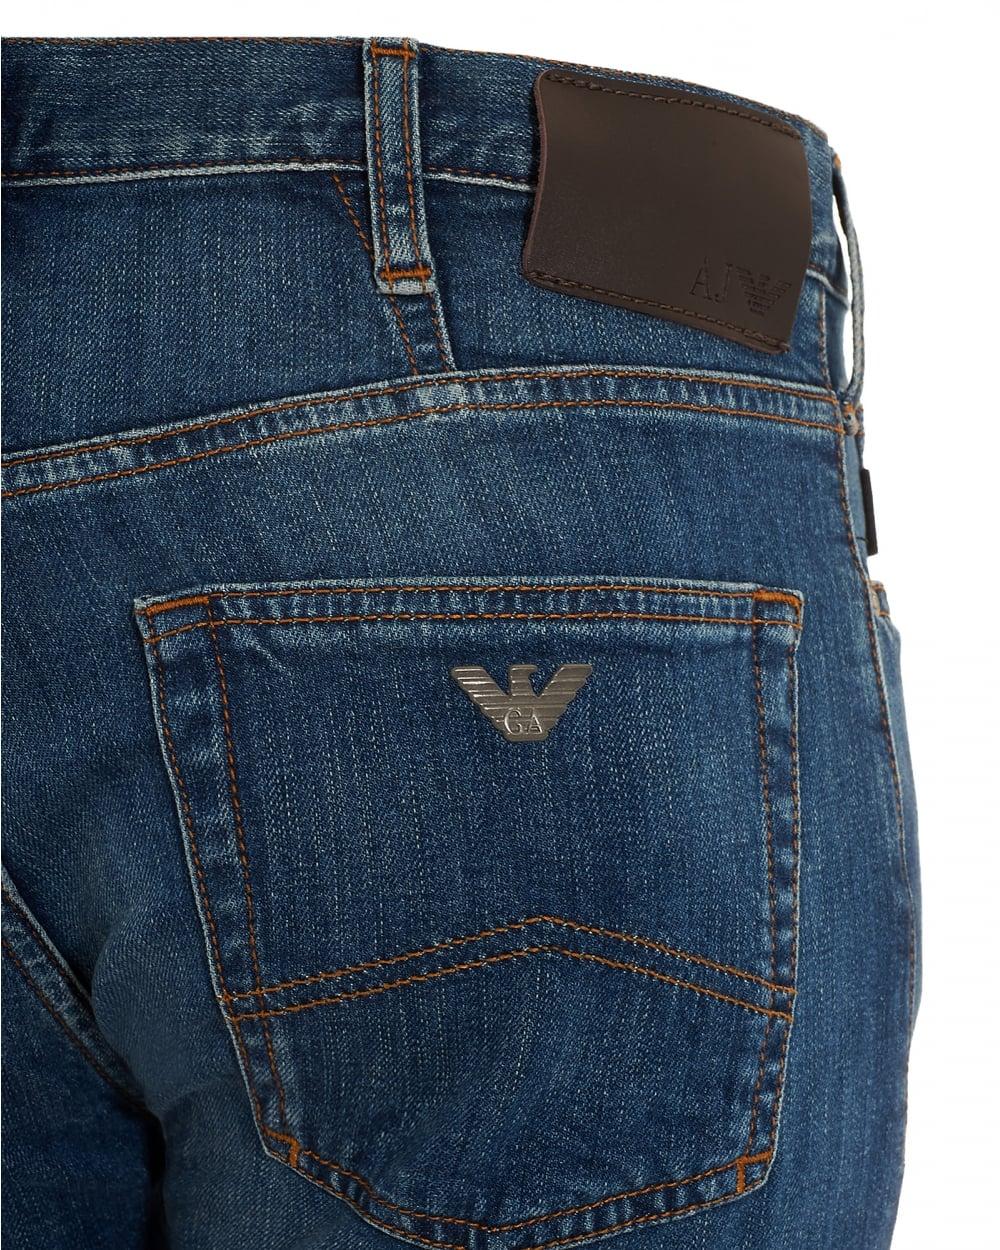 c70032325b130 Armani Jeans Mens J06 Jeans